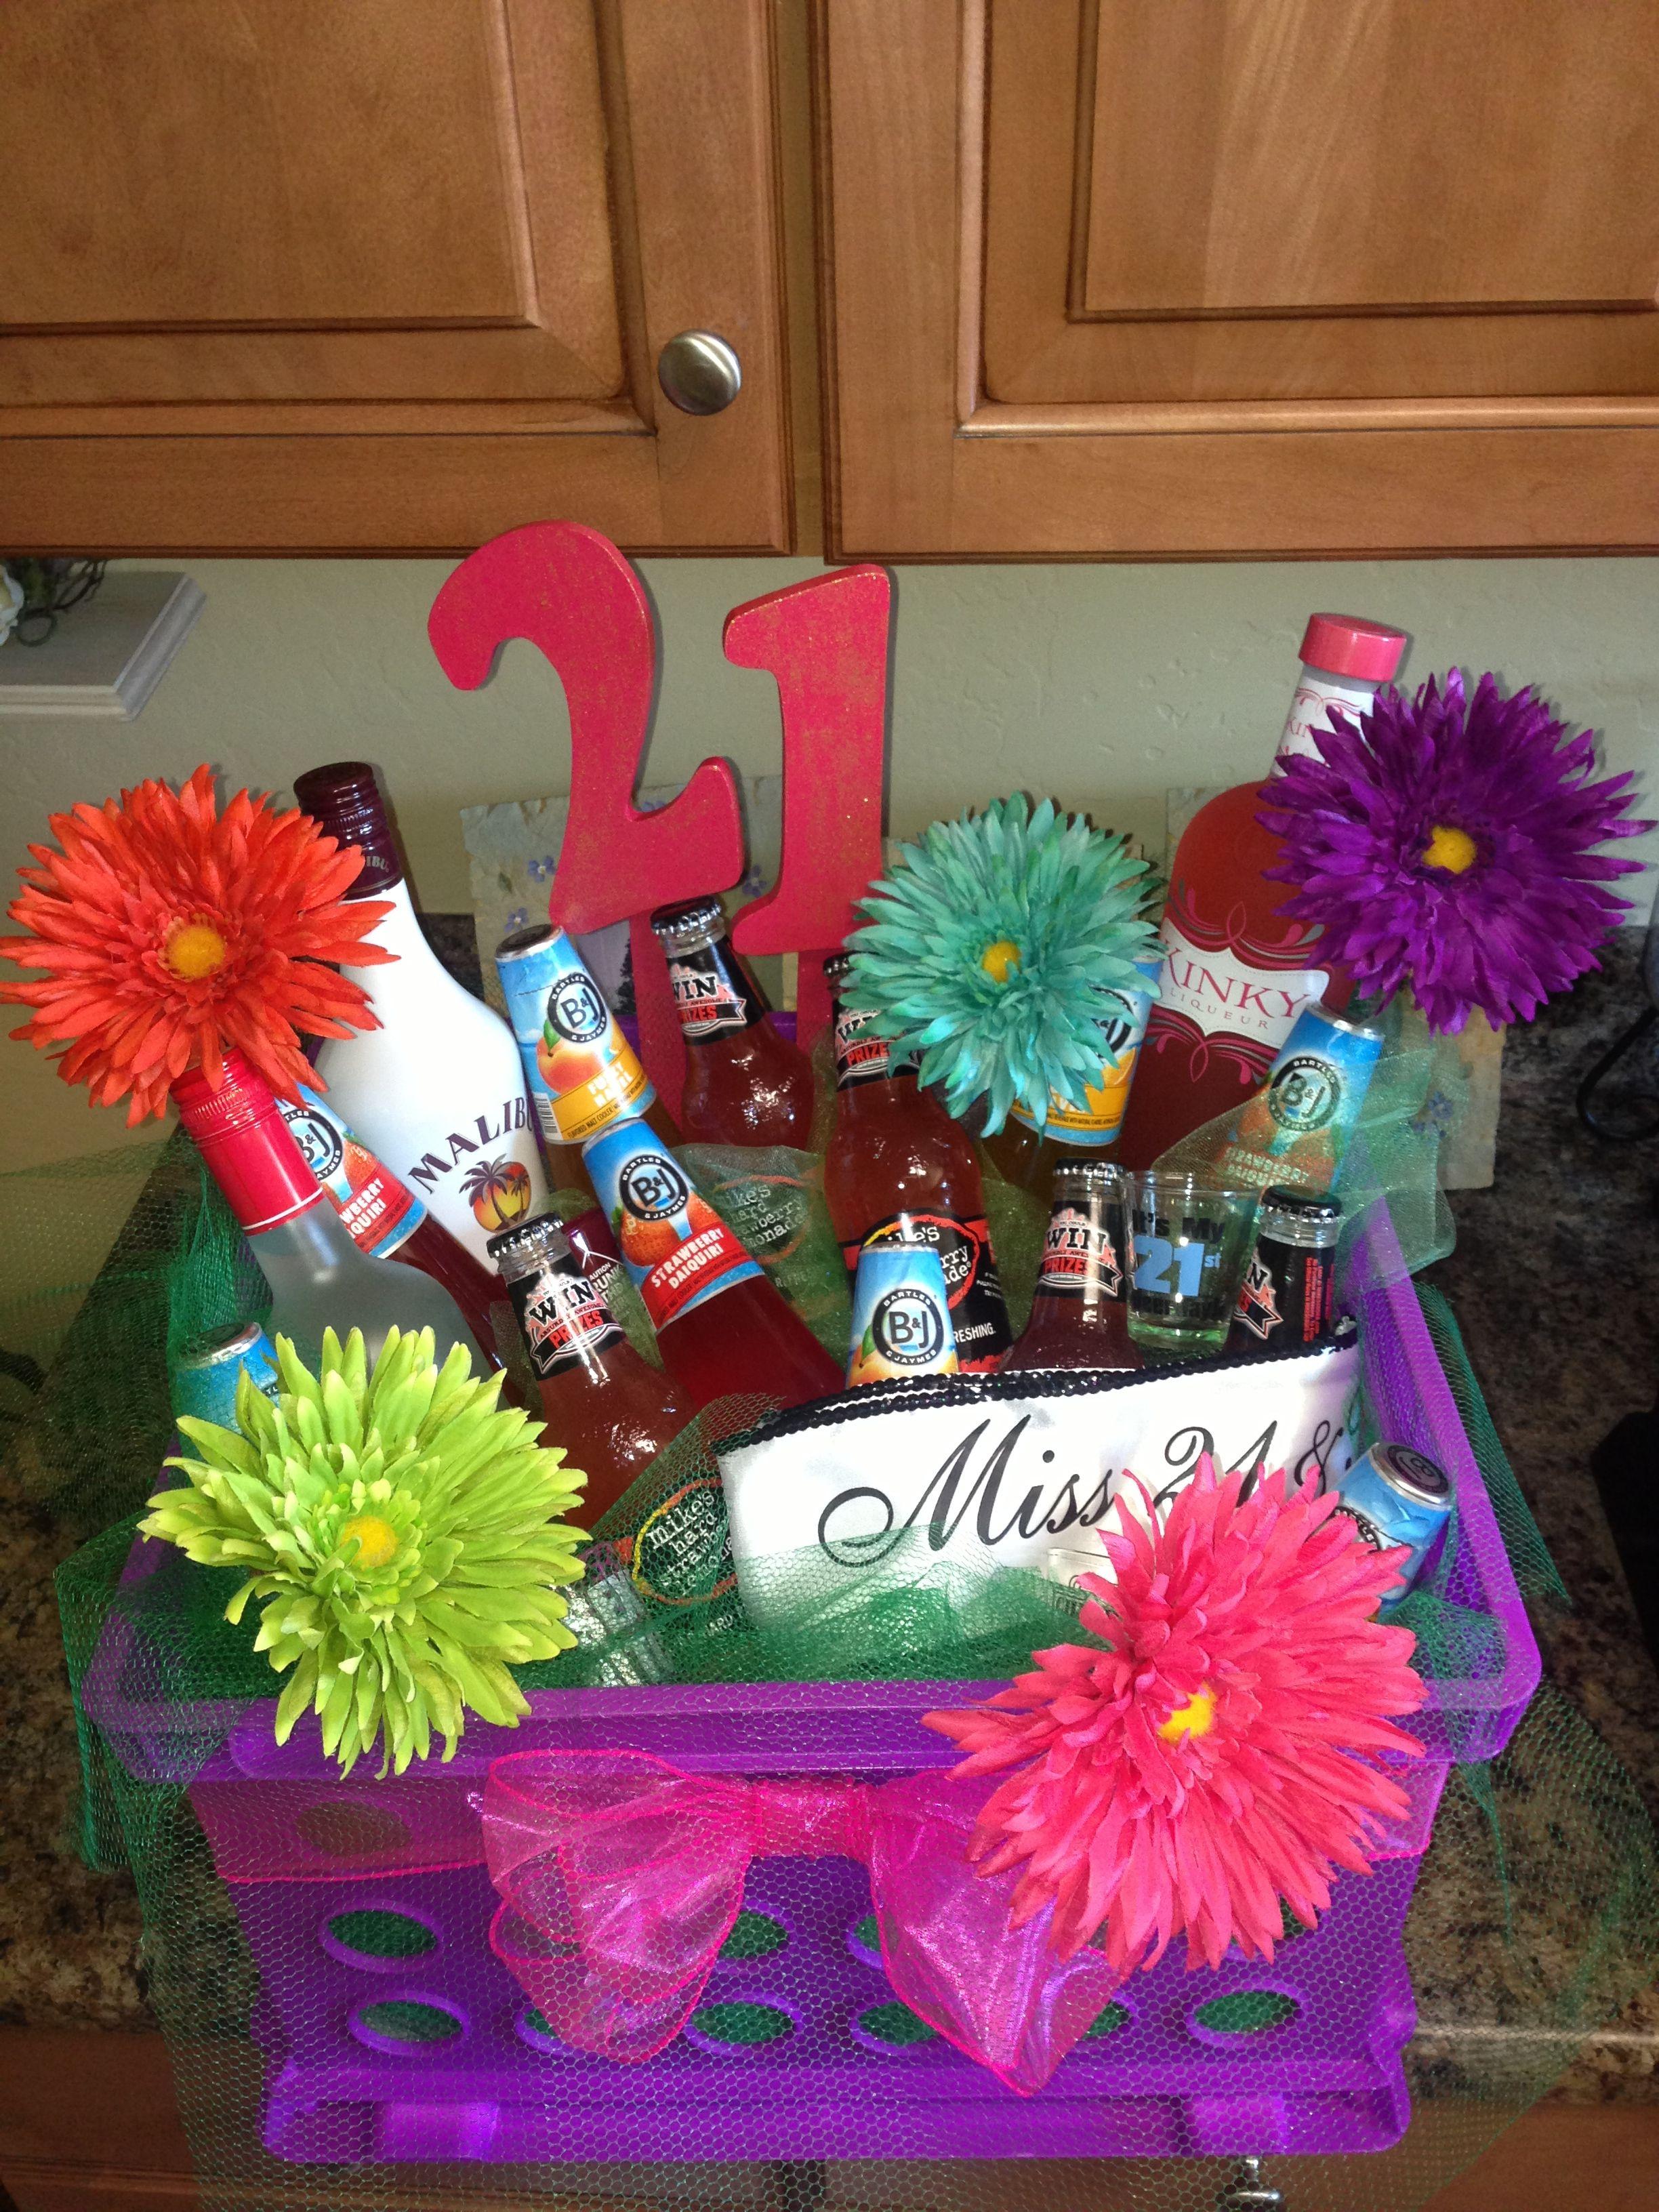 21st Birthday Bucket of Booze Gift Booze gift, 21st